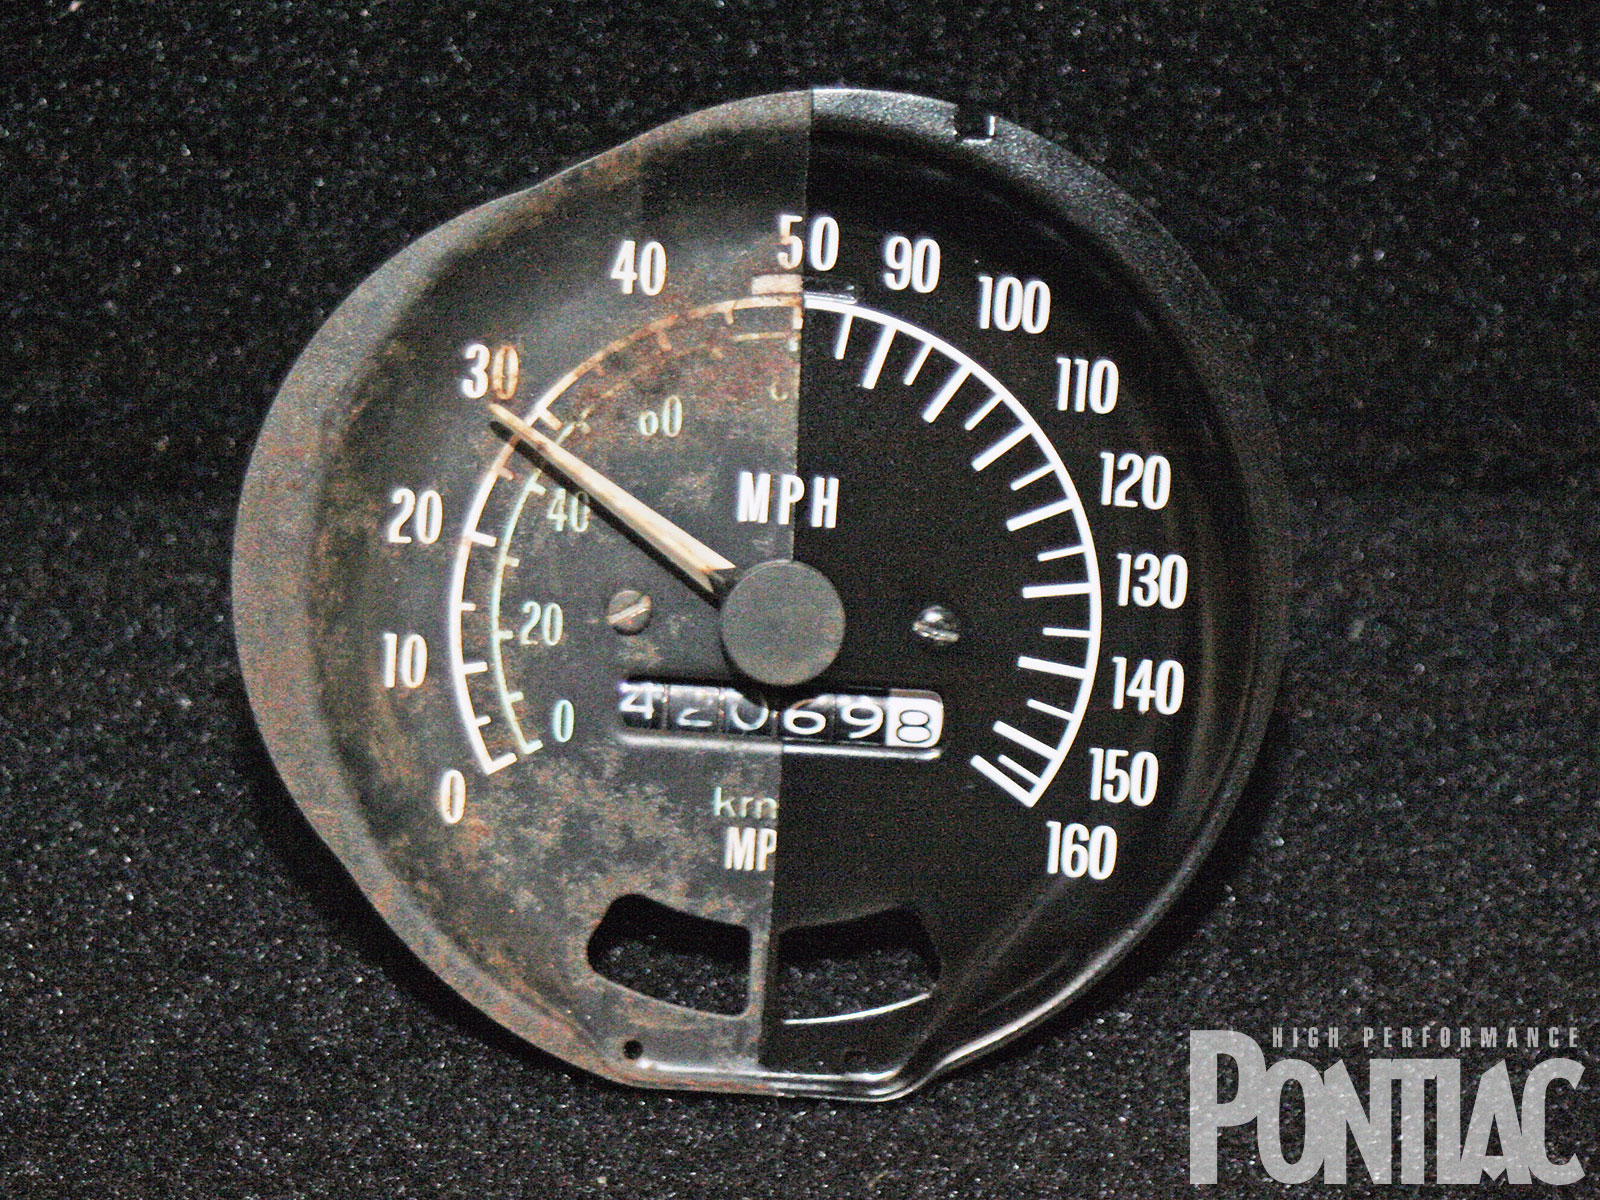 hight resolution of hppp 1006 01 o trans am gauge restoration comparison